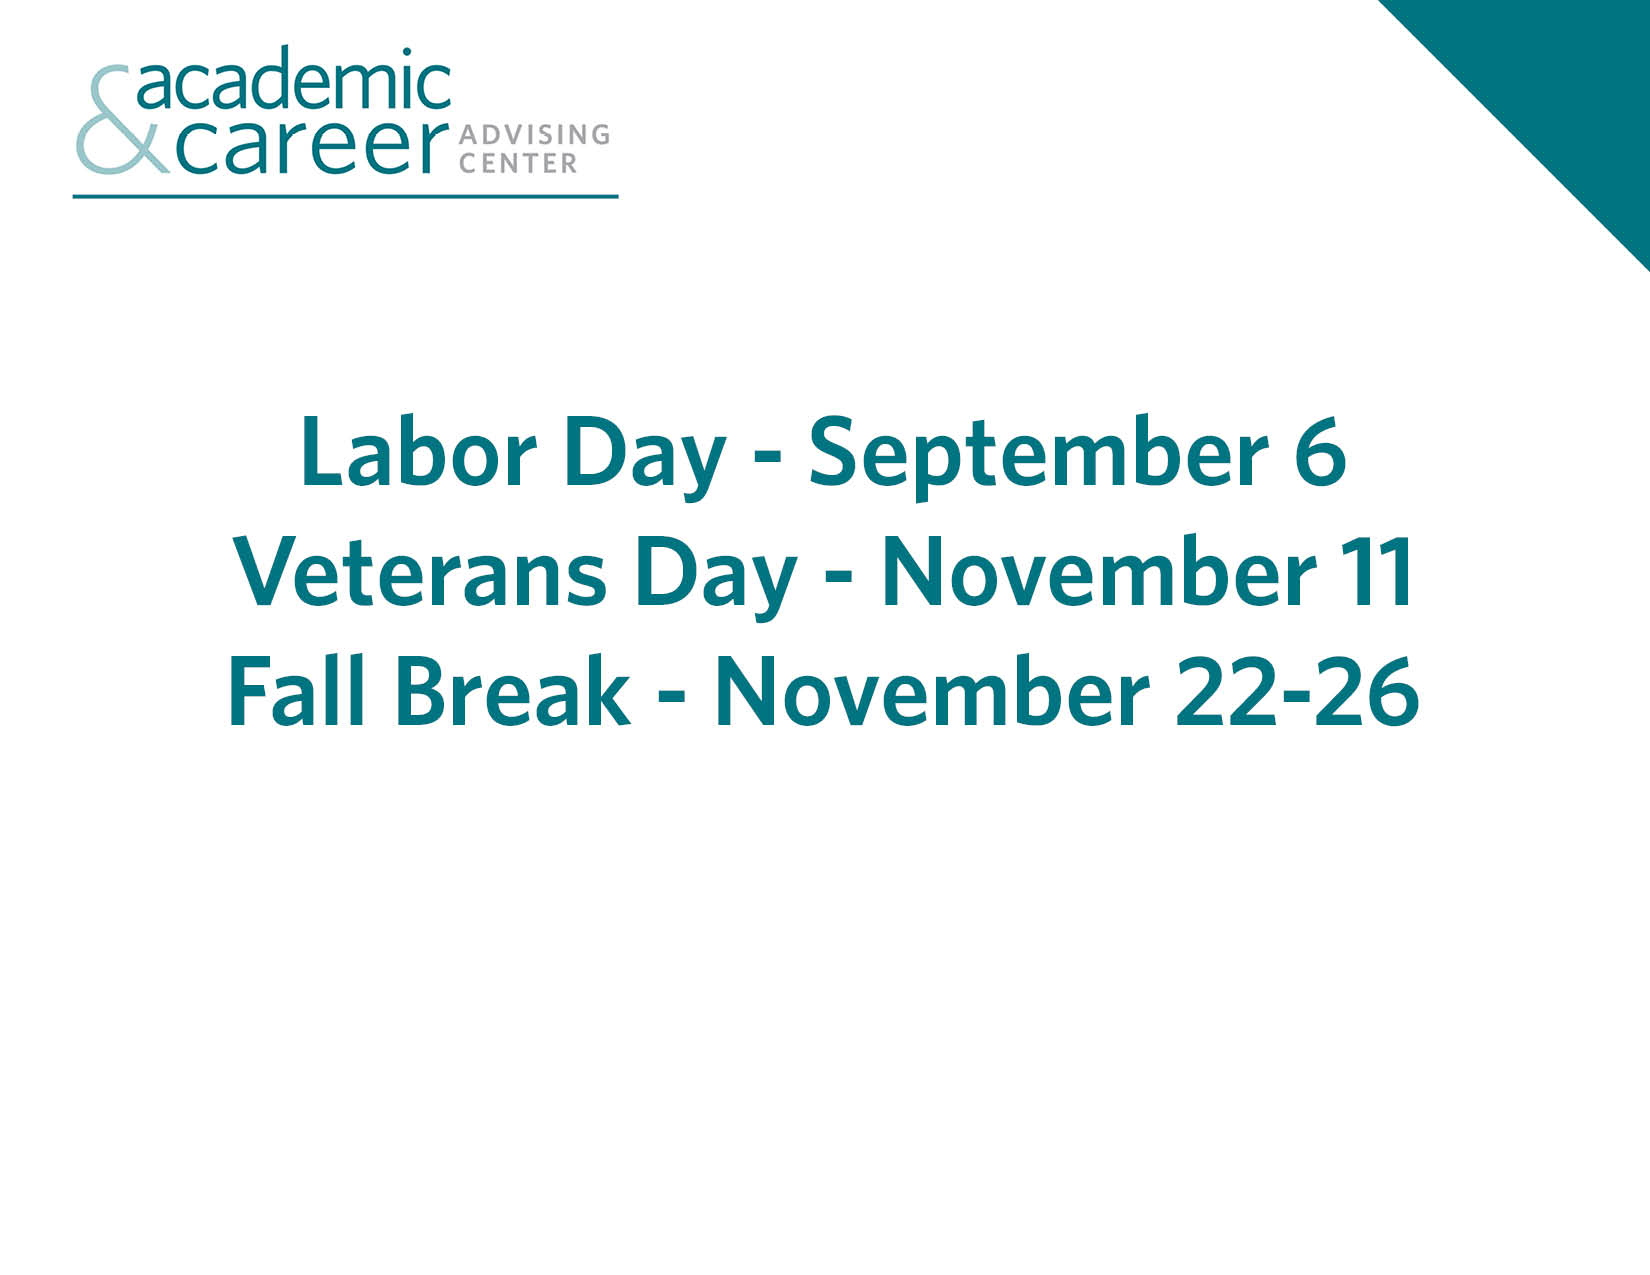 fall holidays, november 11, November 22-26